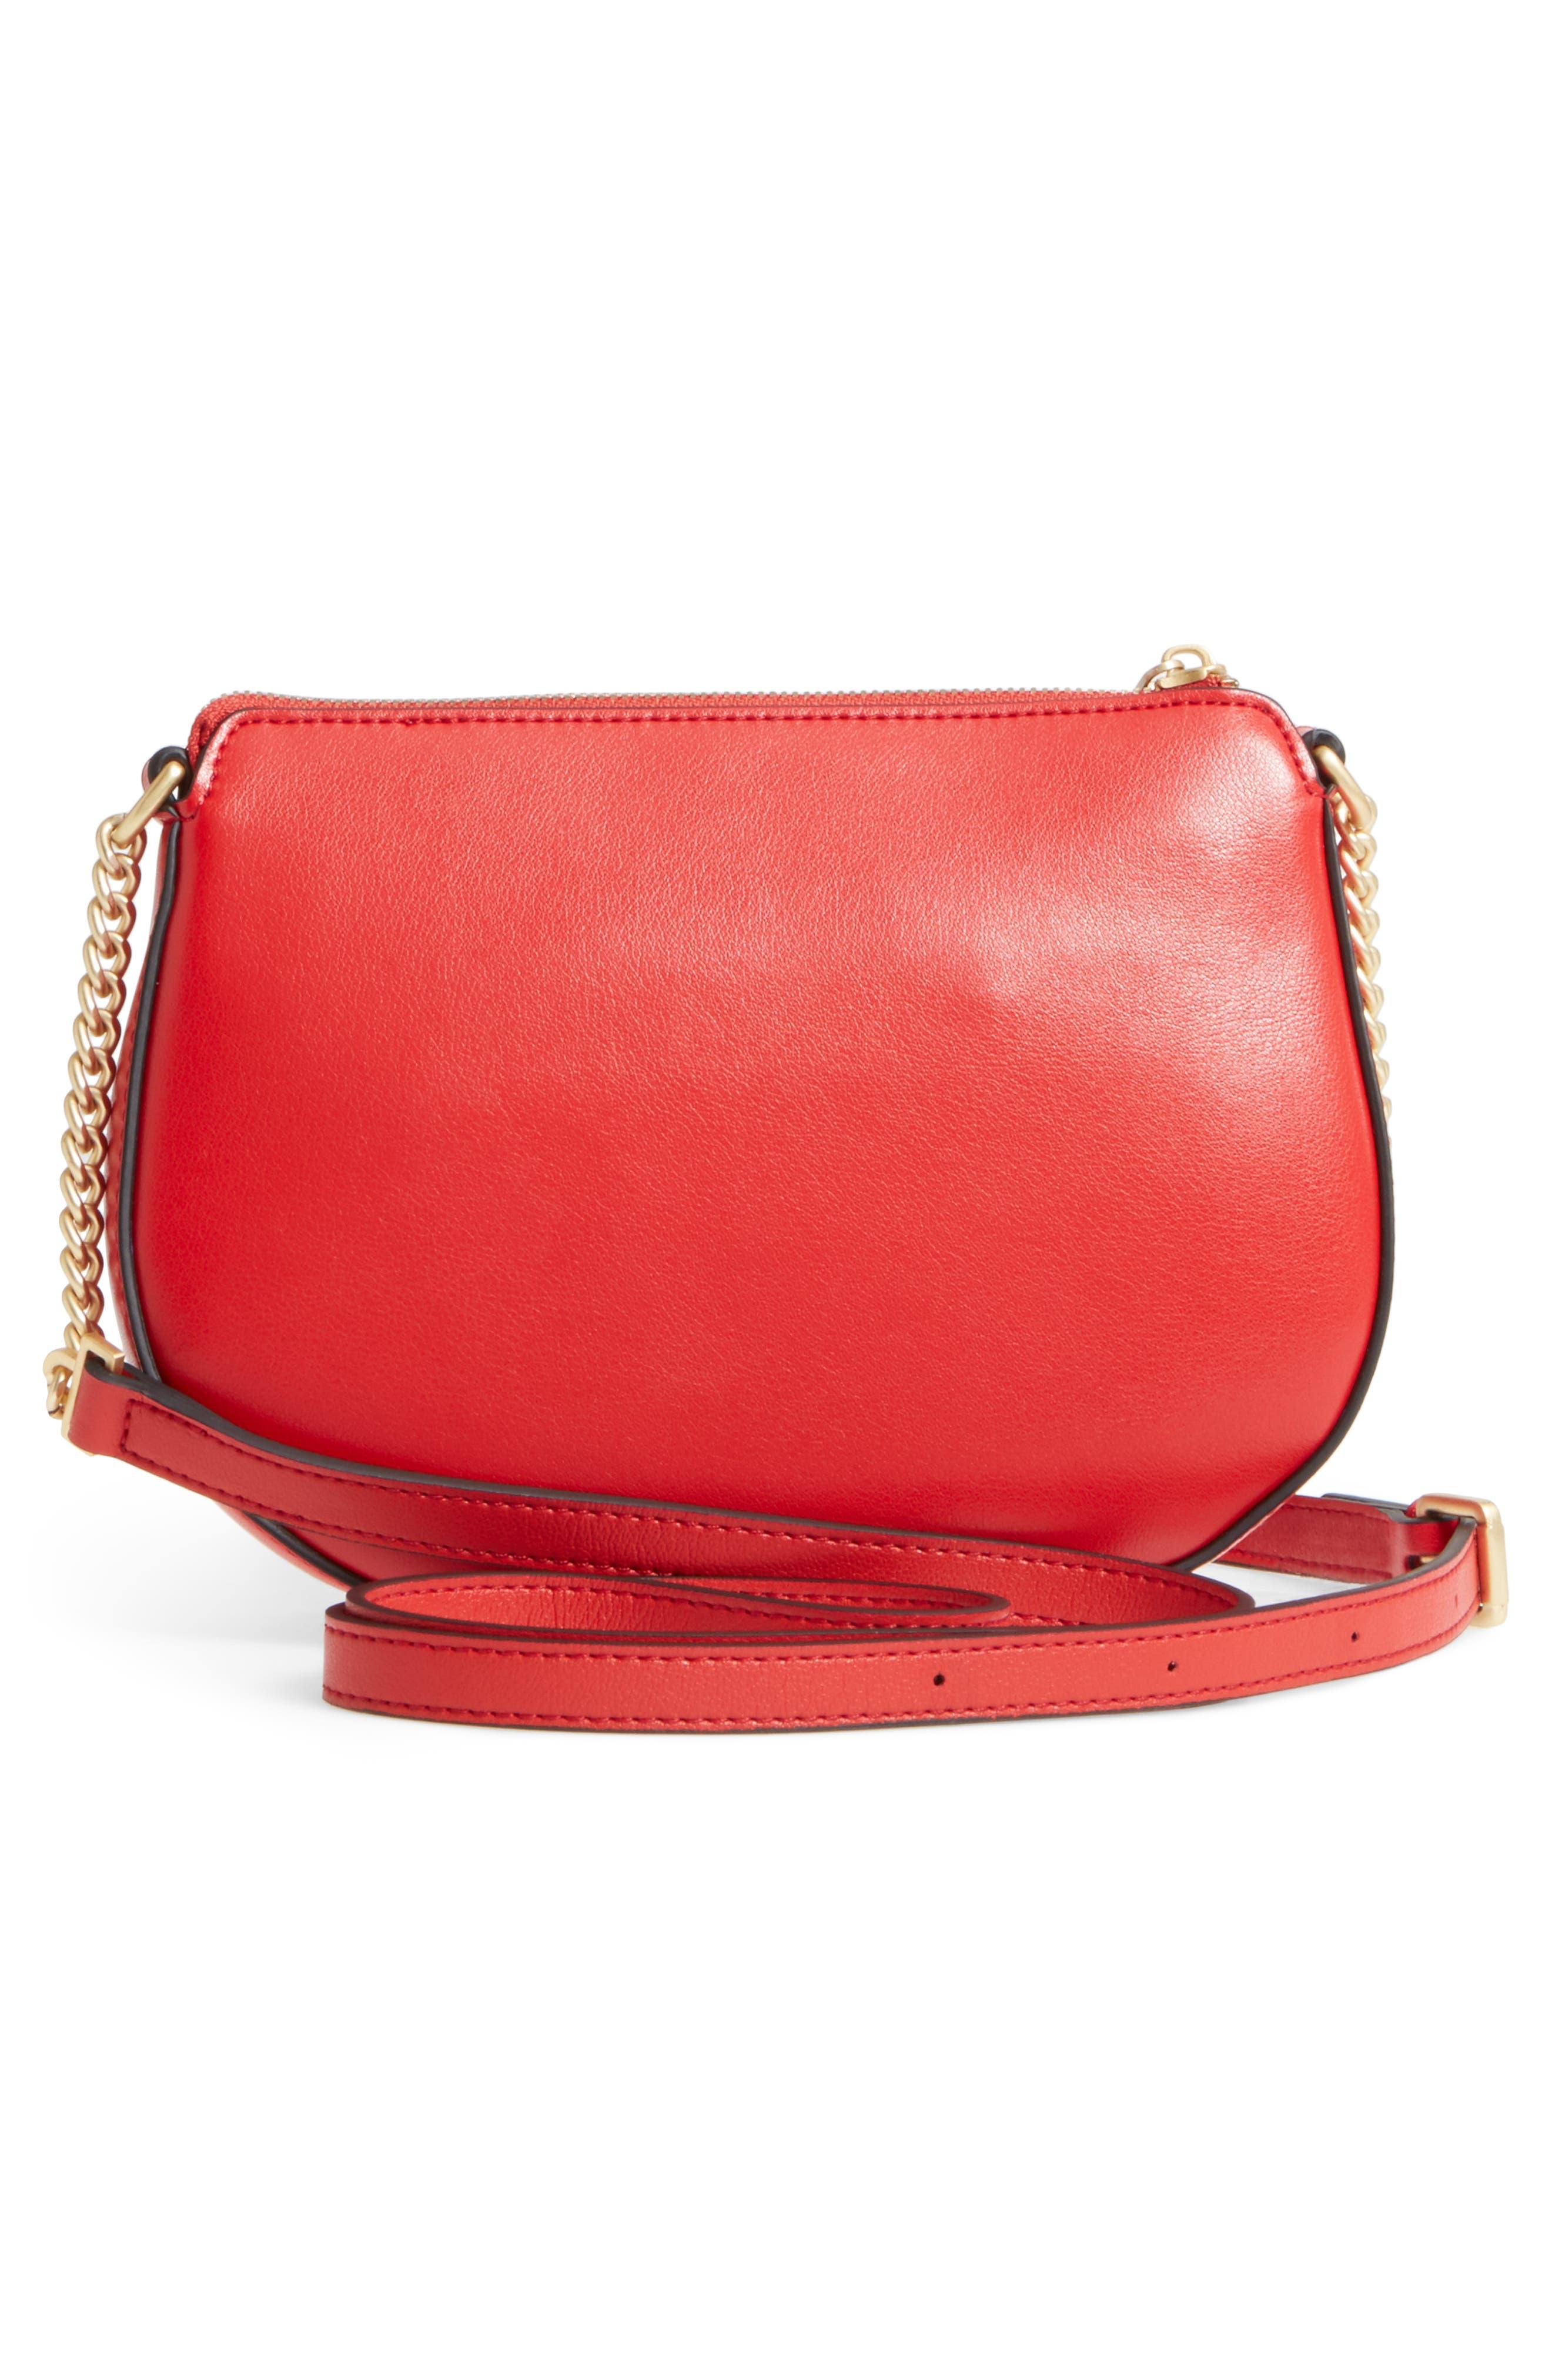 Céline Dion Octave Leather Crossbody Bag,                             Alternate thumbnail 3, color,                             Red